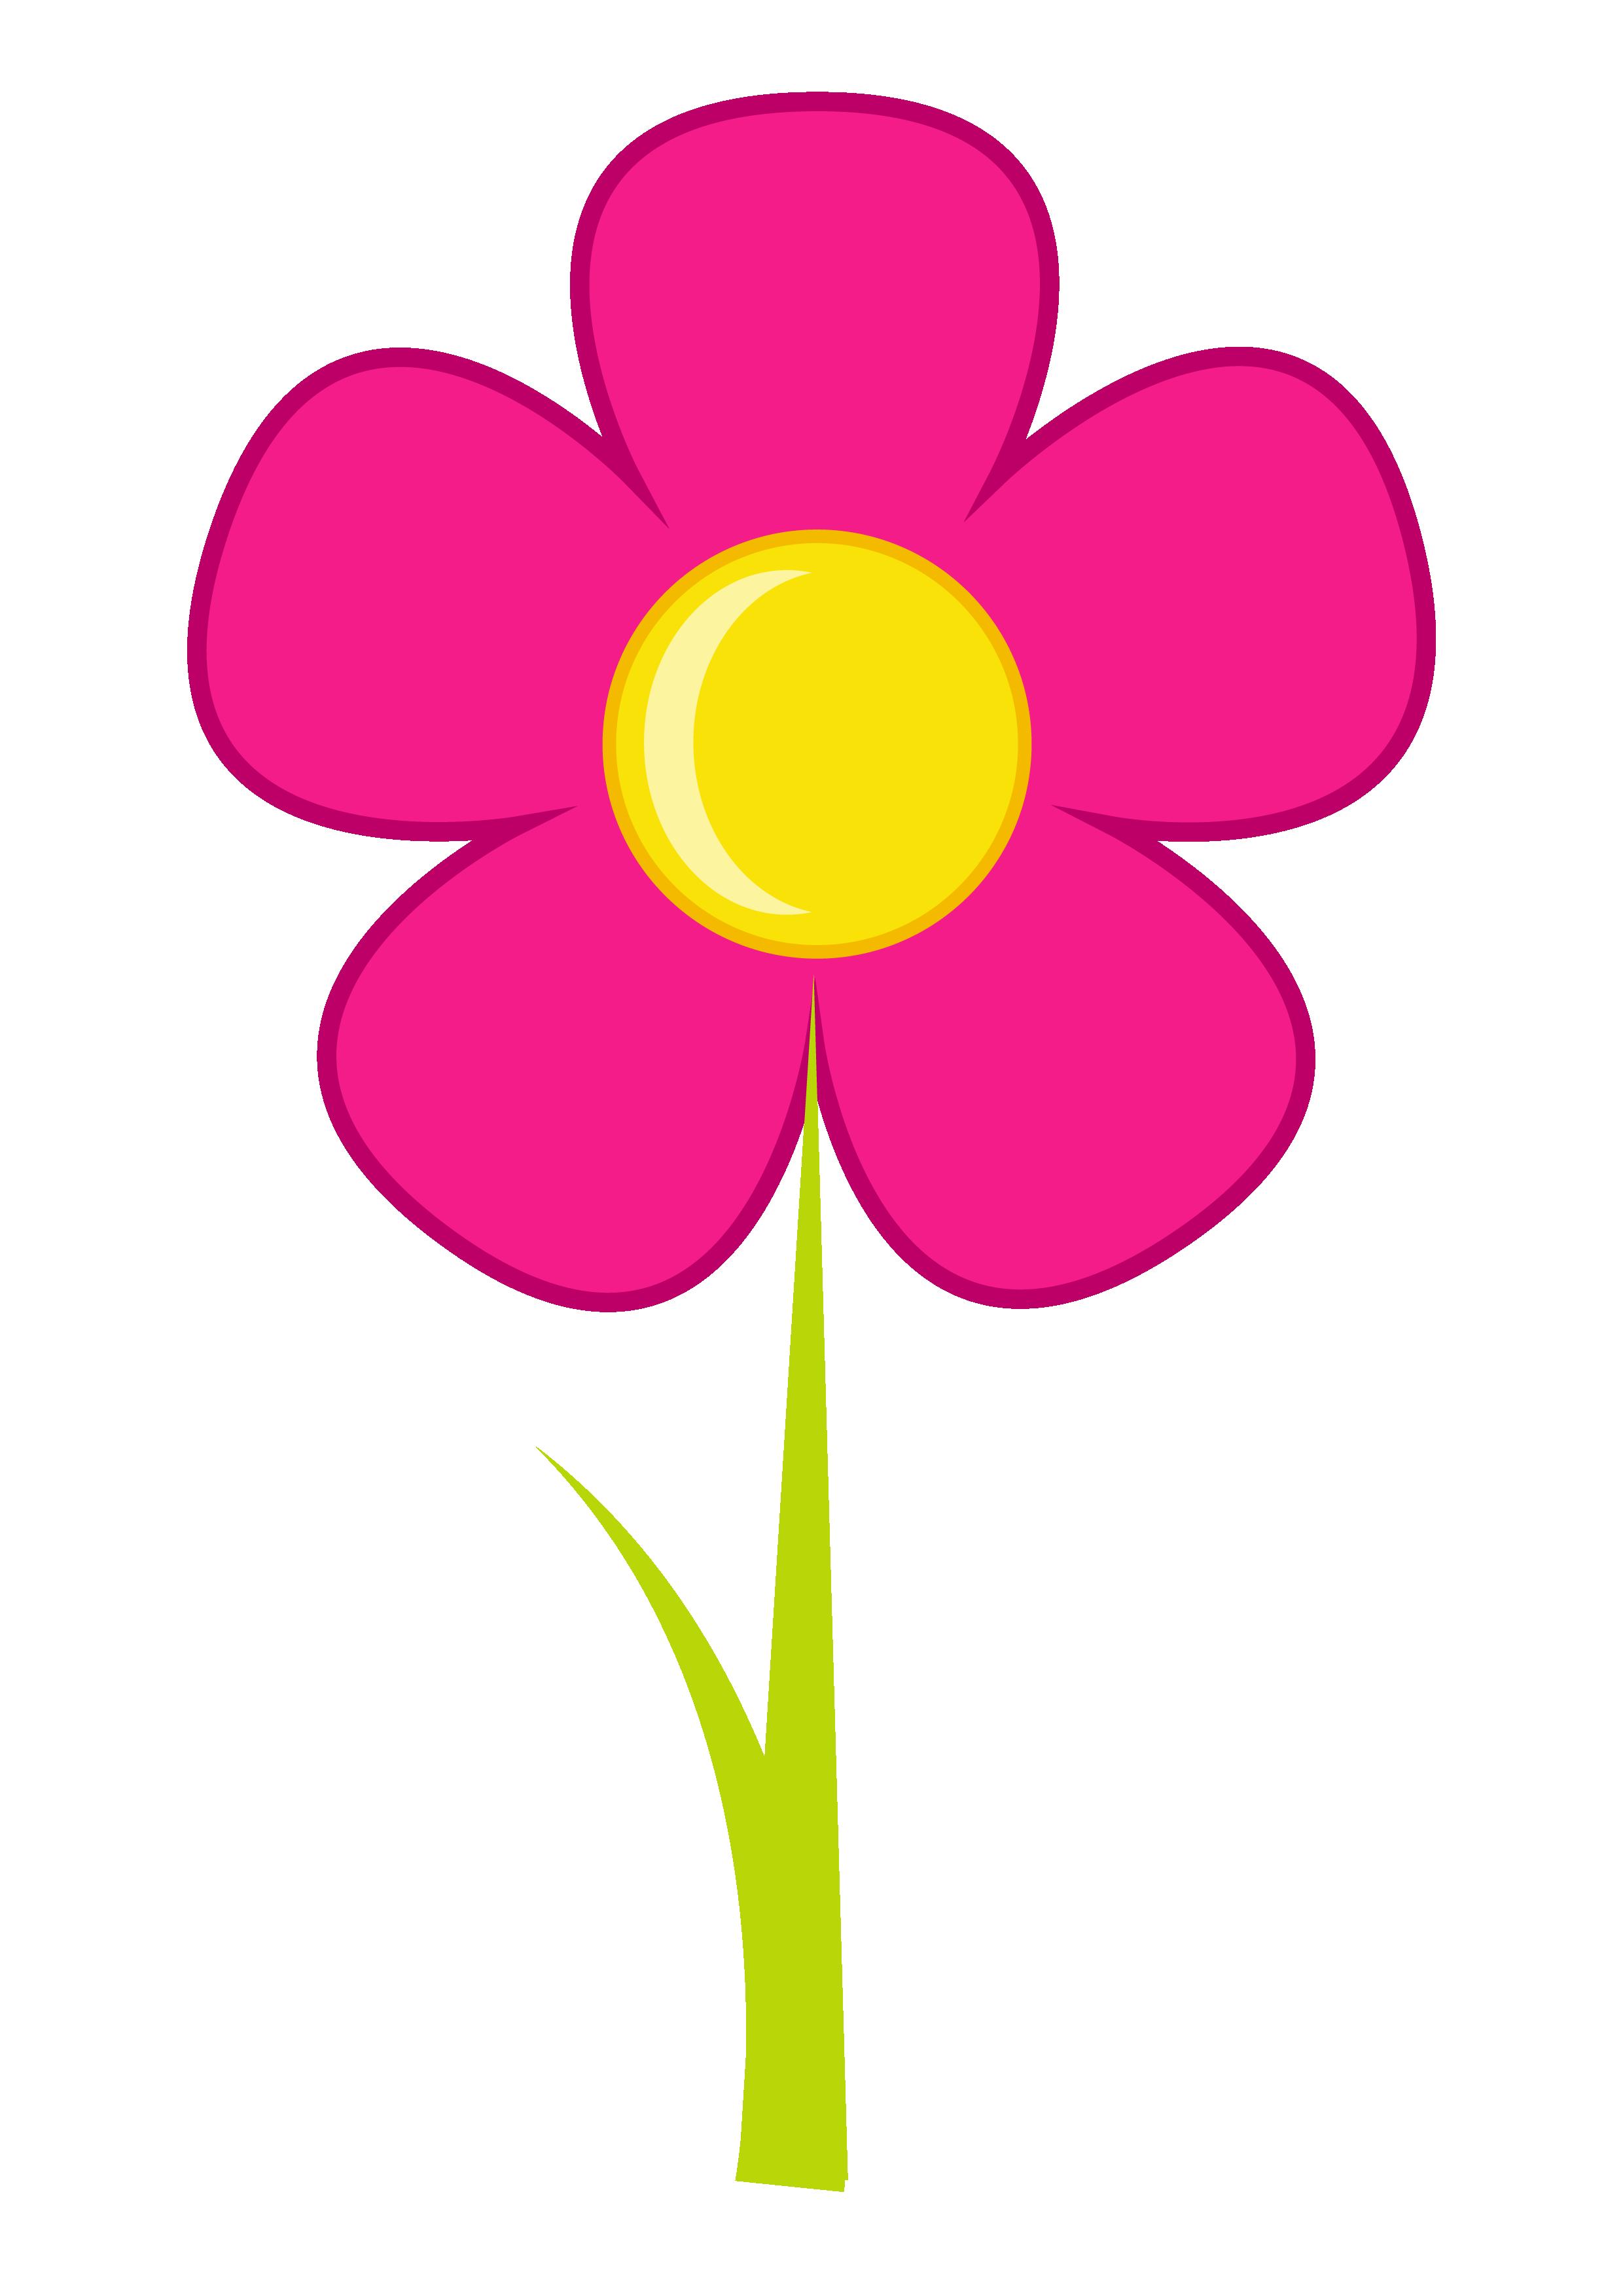 Flower Clip Art Imagenes Flower Art Clip Art Y Colorful Drawings